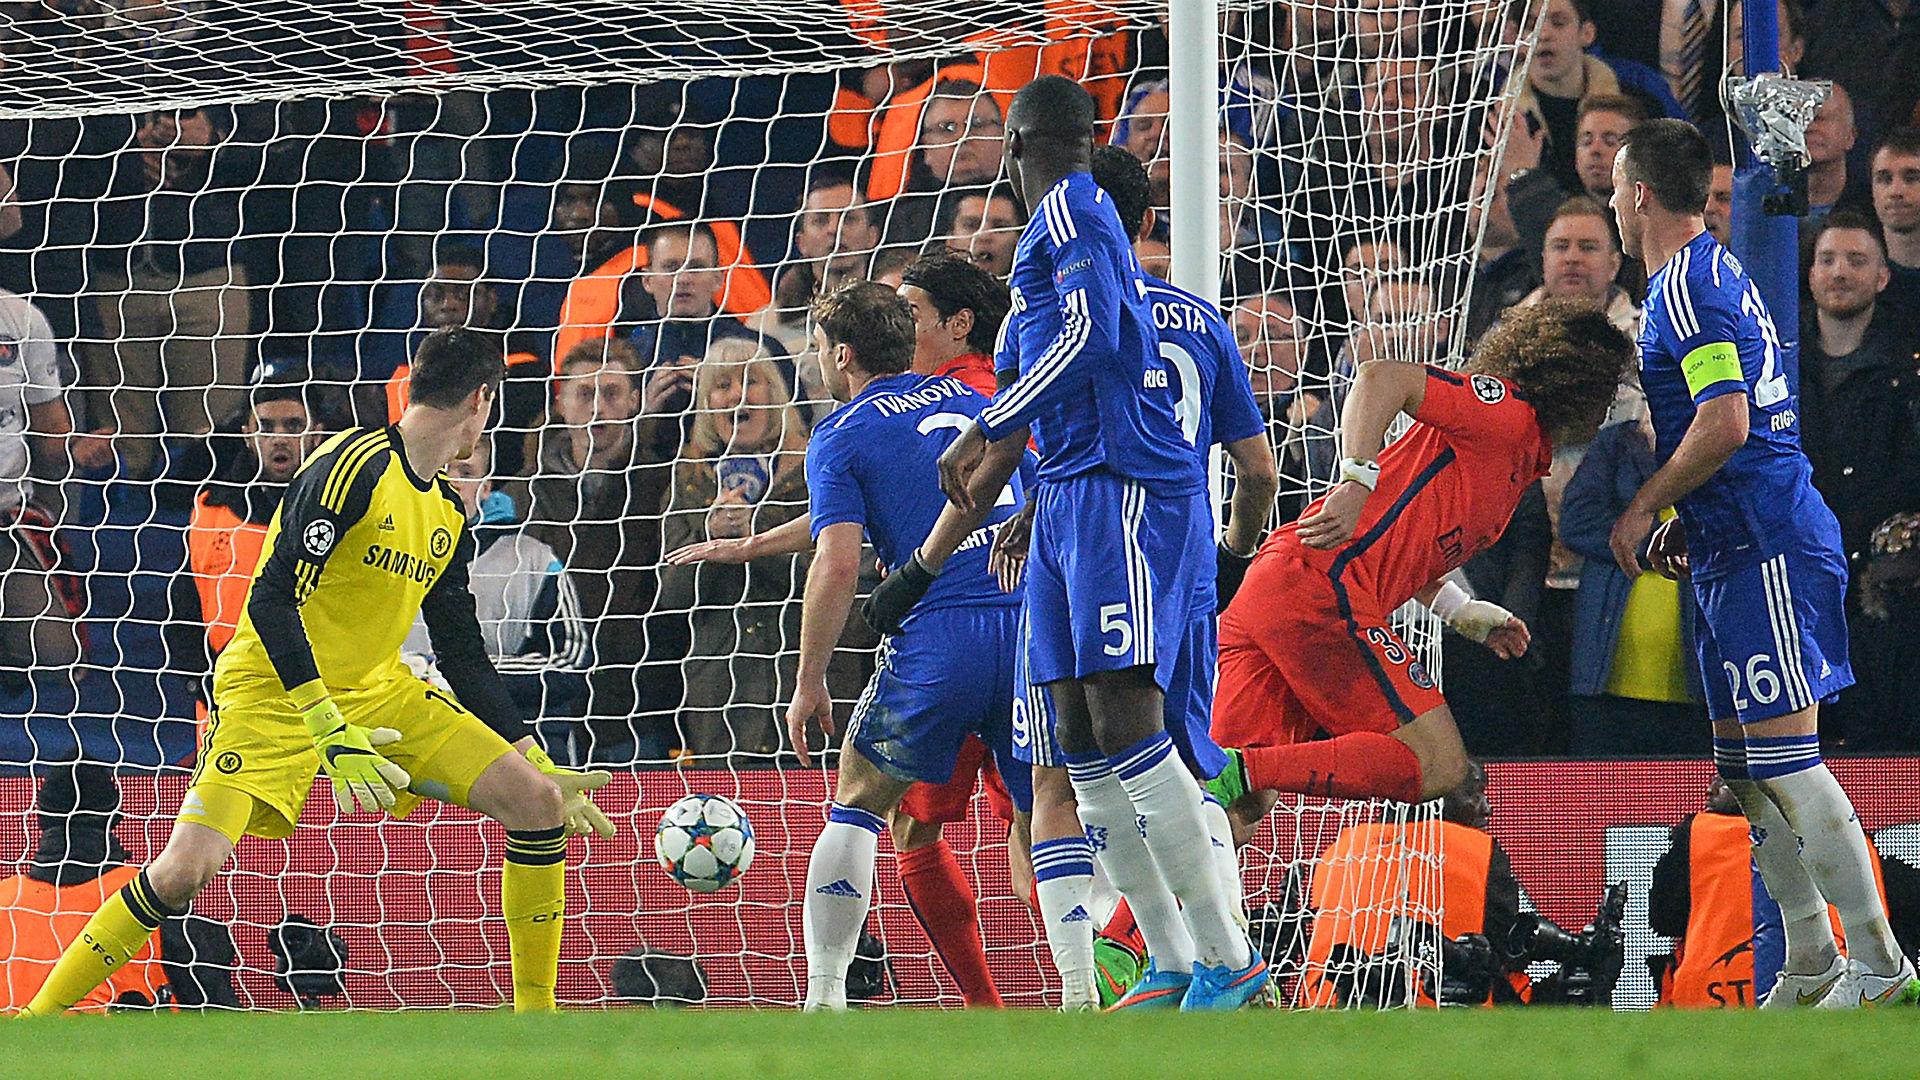 Fantasy Premier League: Top five defender rankings for 2015-16